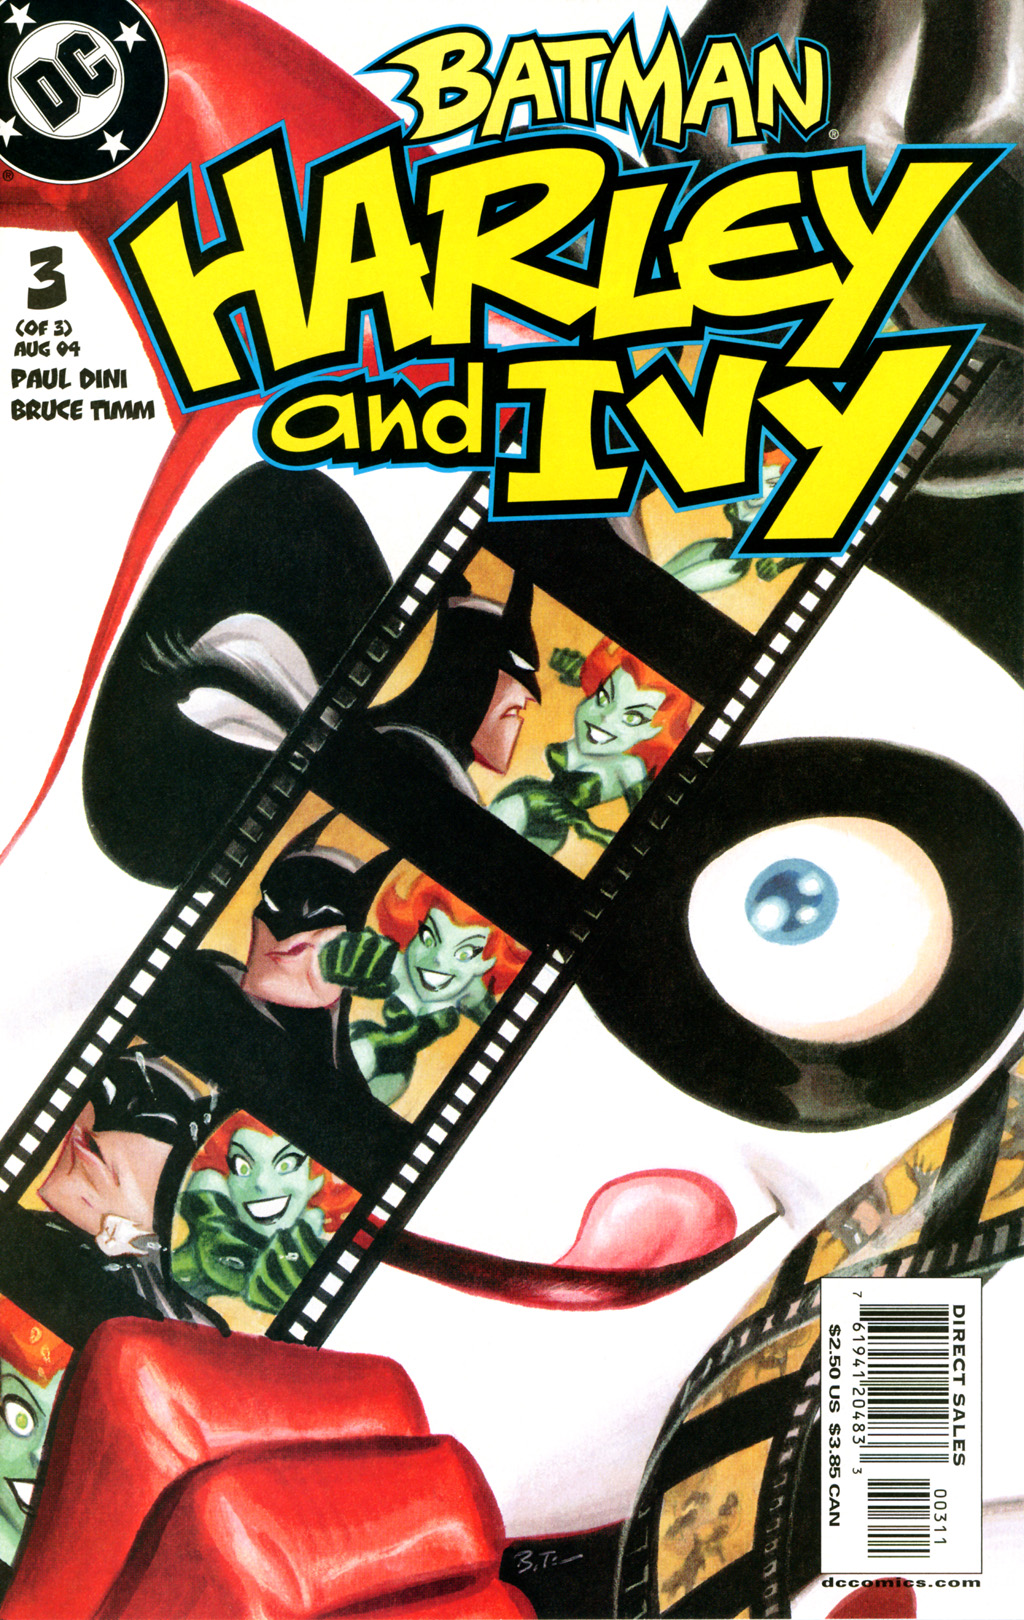 Batman: Harley & Ivy 3 Page 1